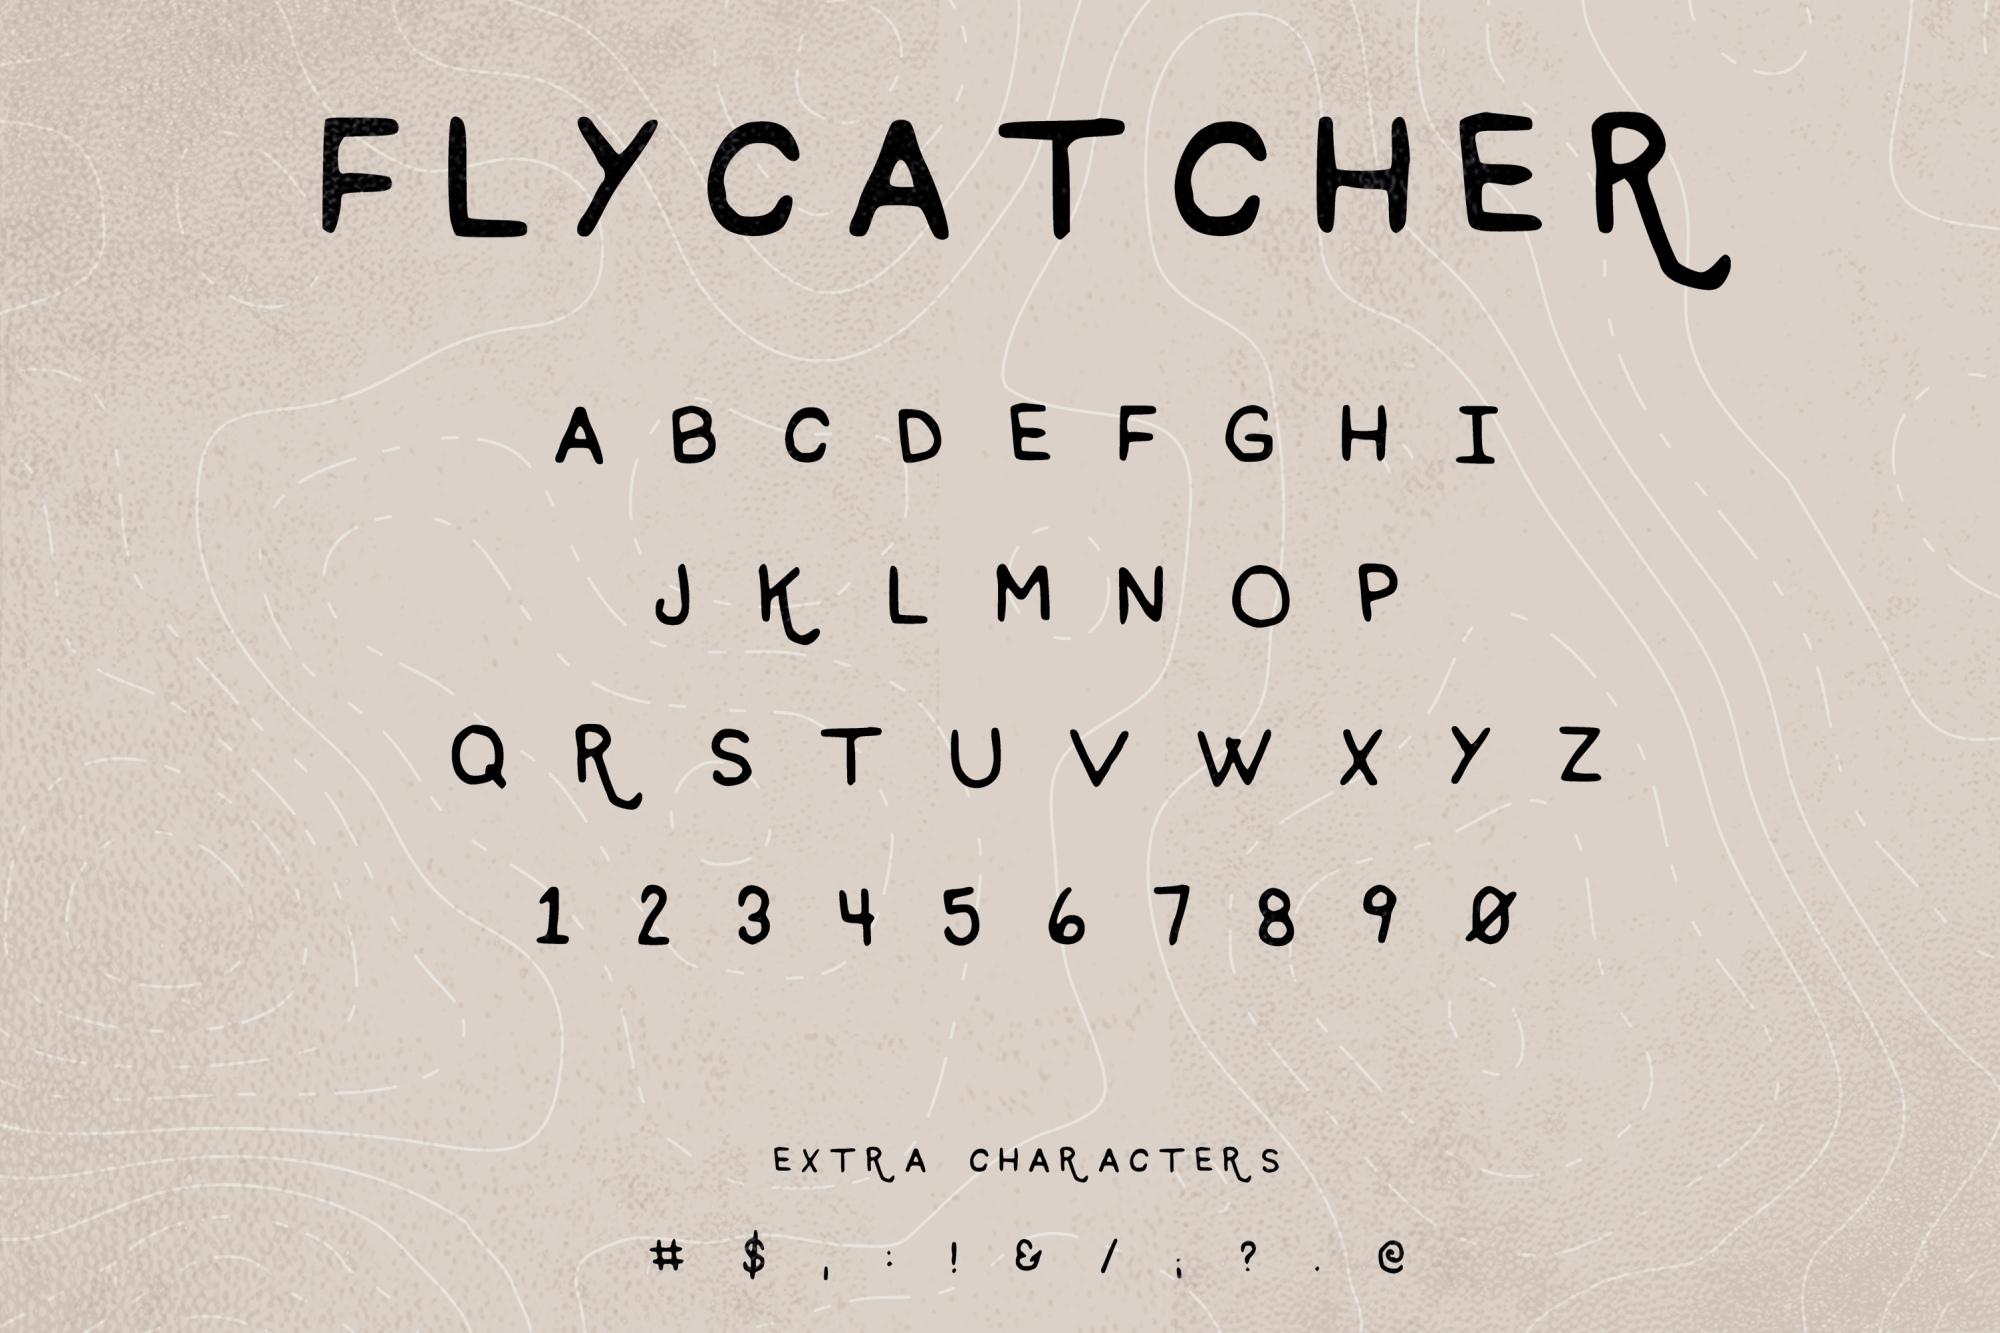 Flycatcher Characters